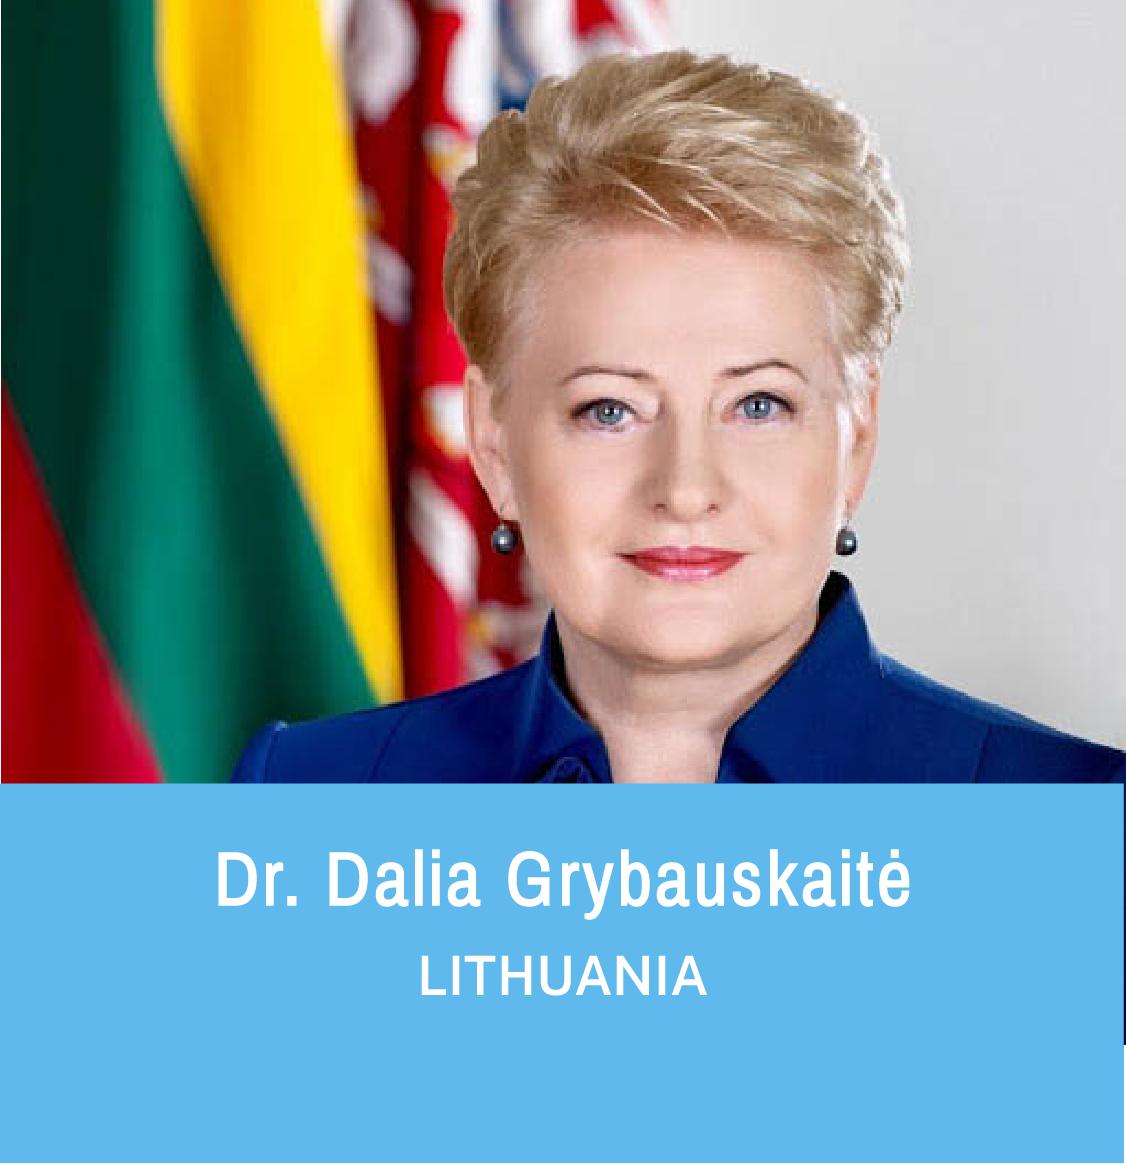 Dr. Dalia Grybauskaitė, Former President of Lithuania